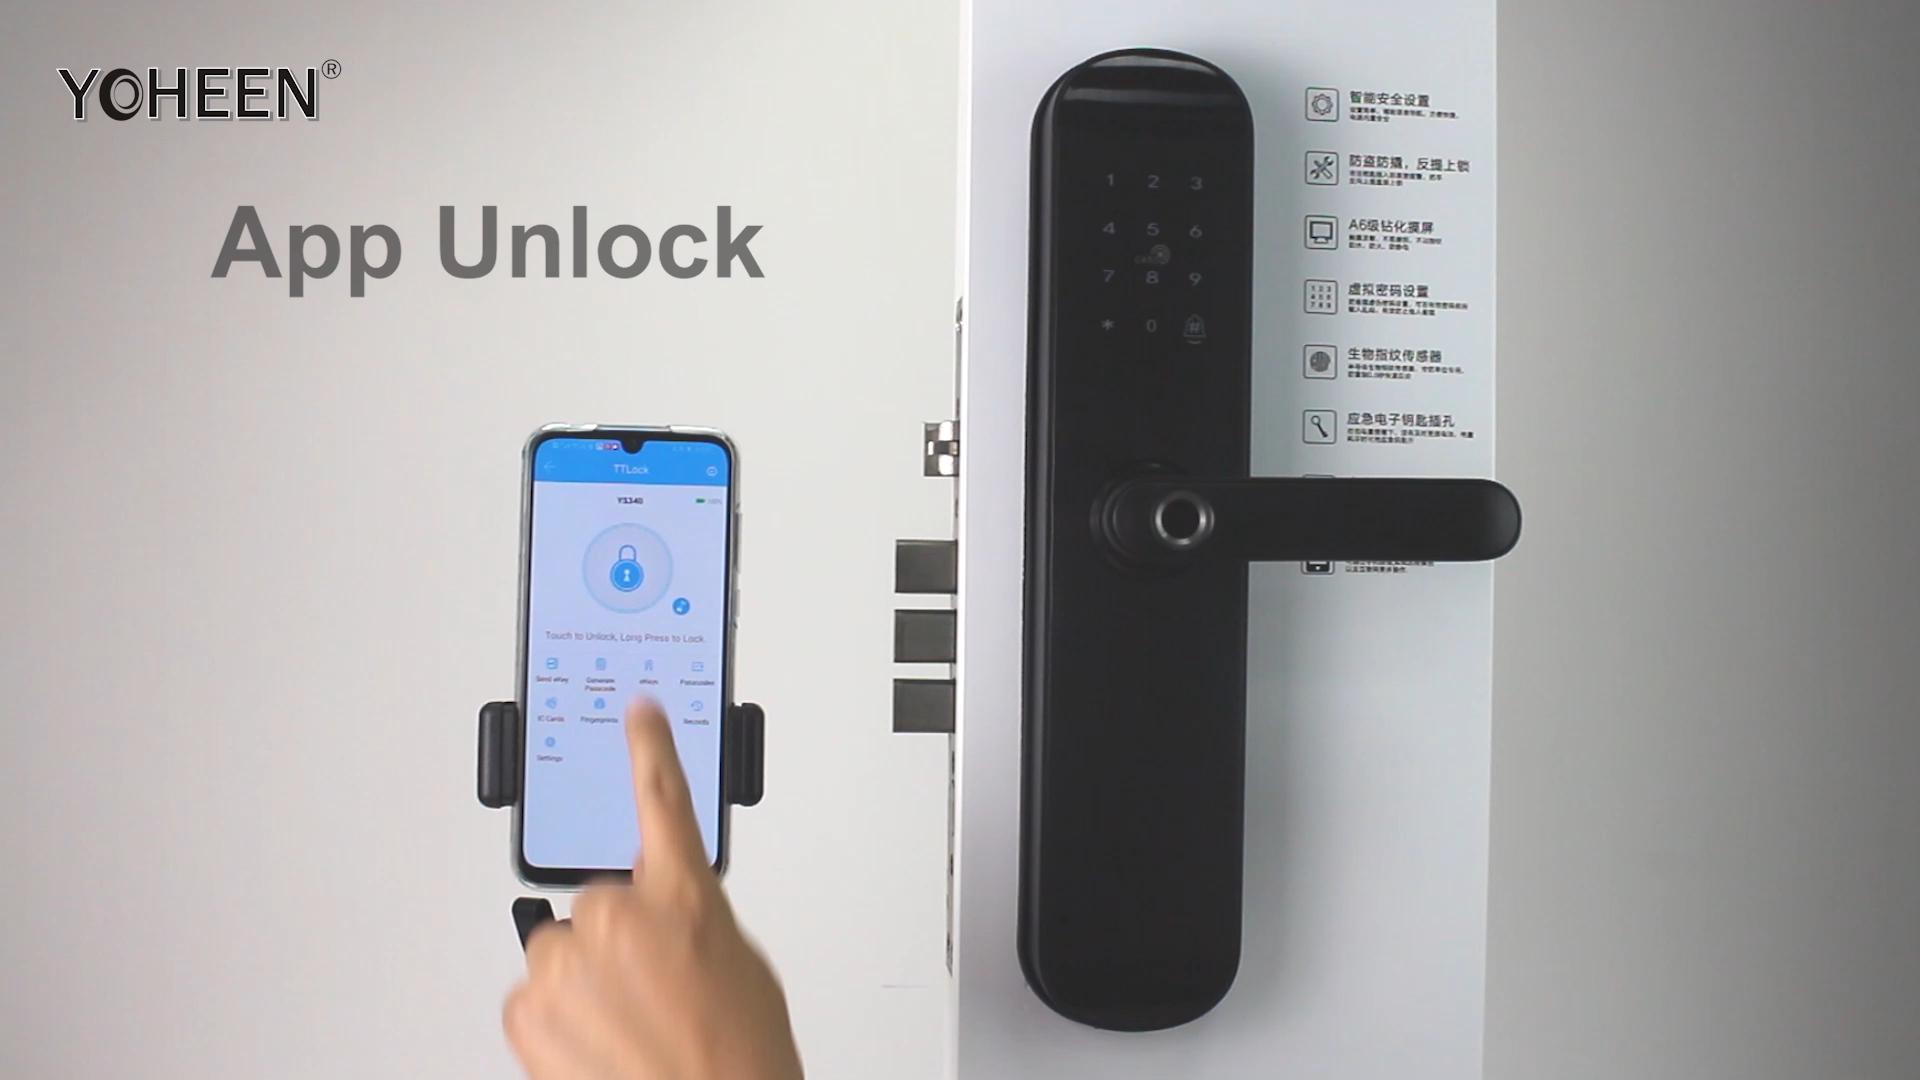 Yoheen Kunci Pintu Biometrik Elektronik, Pengunci Pintu Sidik Jari Biometrik Kartu IC Kode Digital WiFi, Aplikasi Bluetooth Cerdas, Keamanan Elektronik untuk Rumah